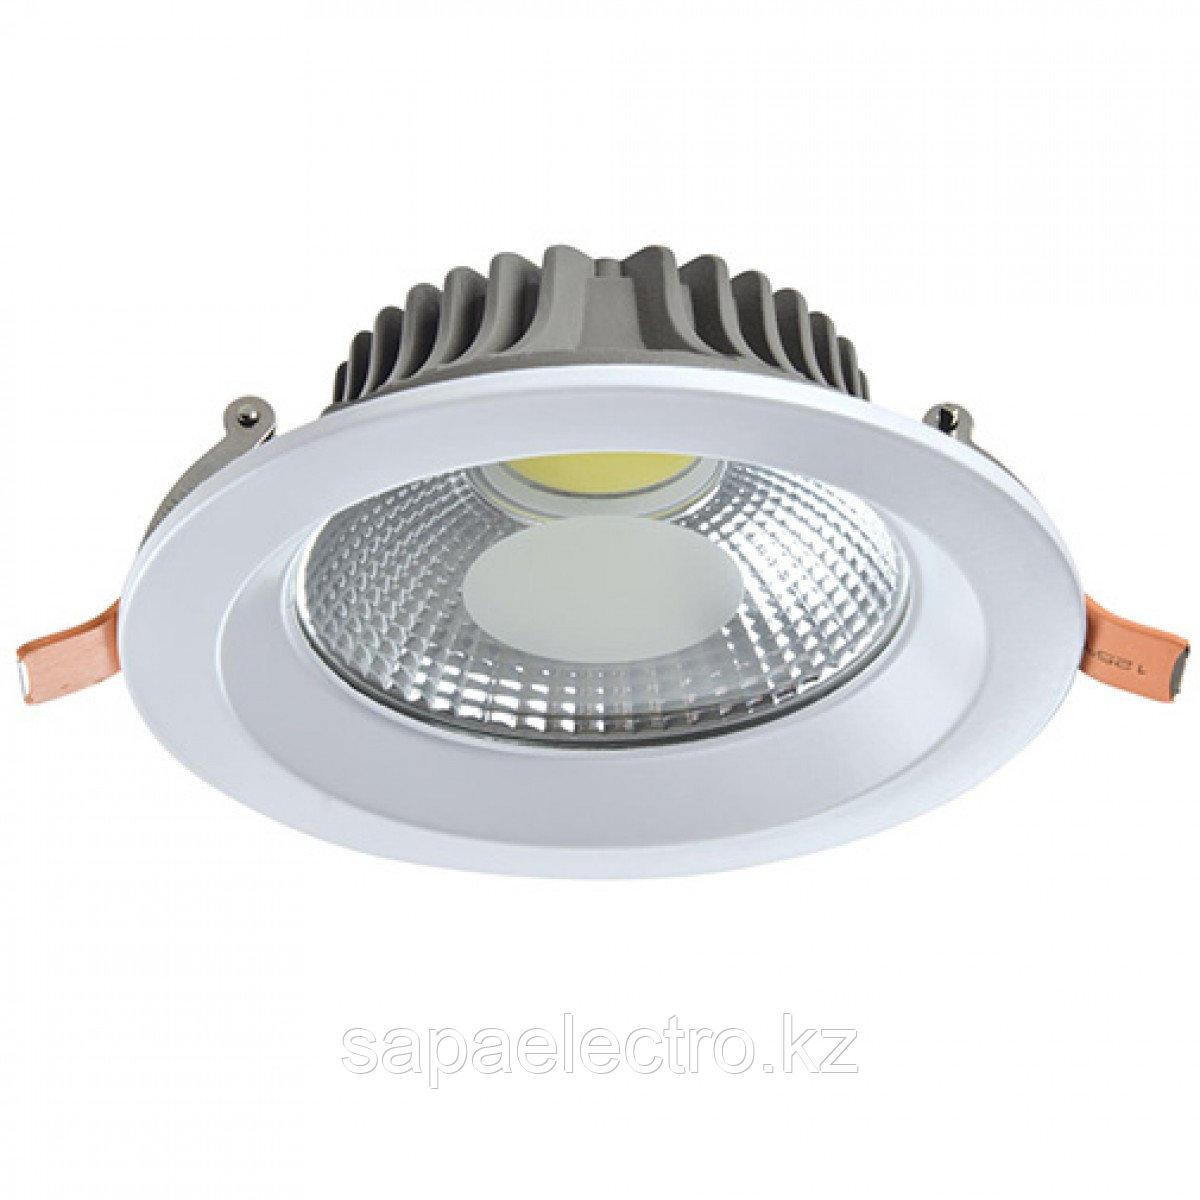 Свет-к DOWNLIGHT LED AVENA COB 12W 5000K (TS) 50шт